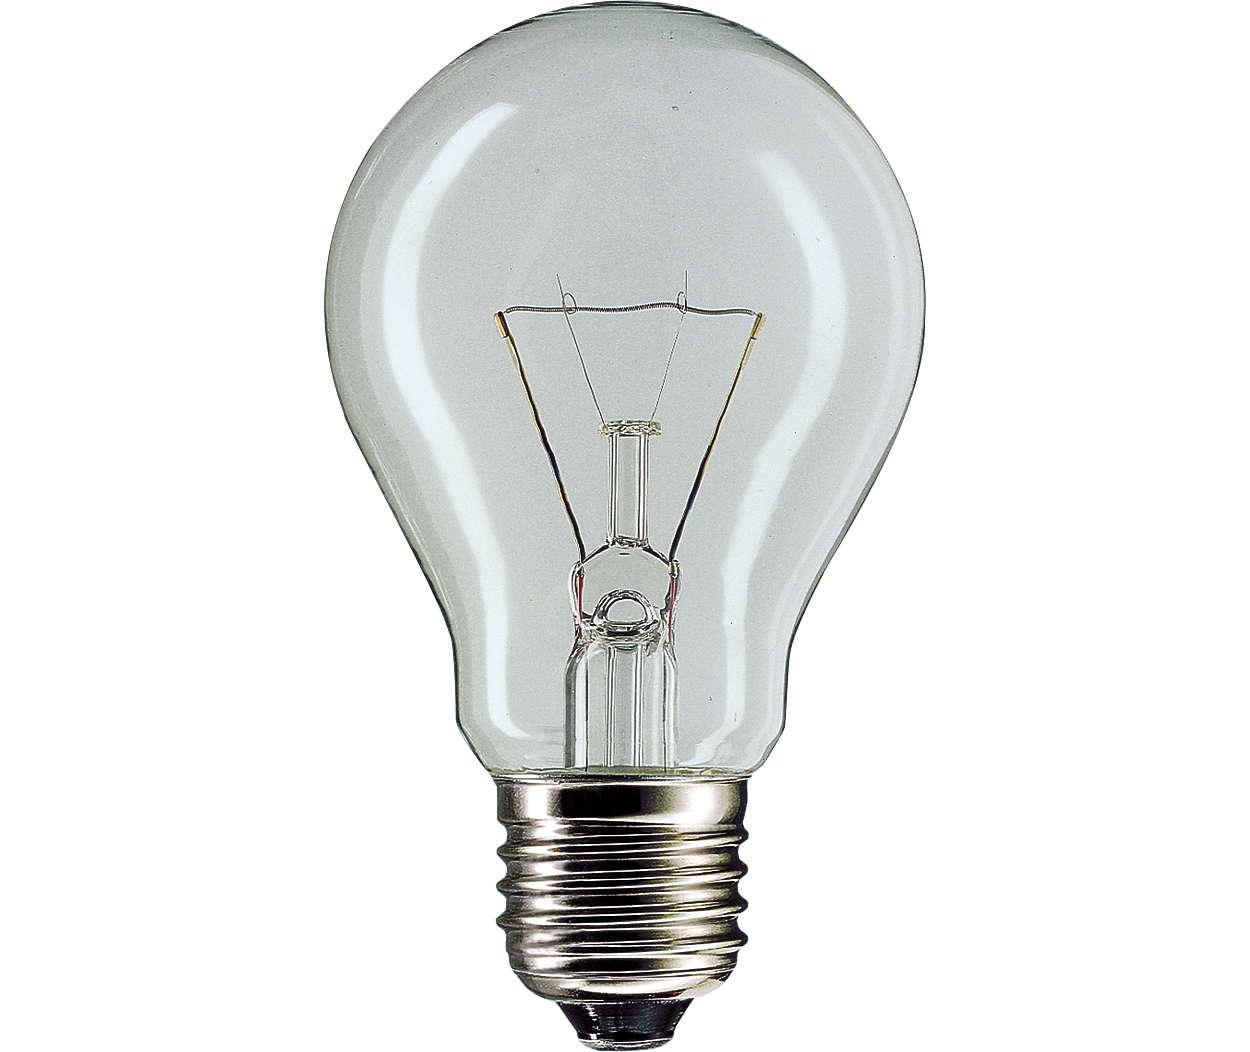 100w Light Bulb: Product Description,Lighting